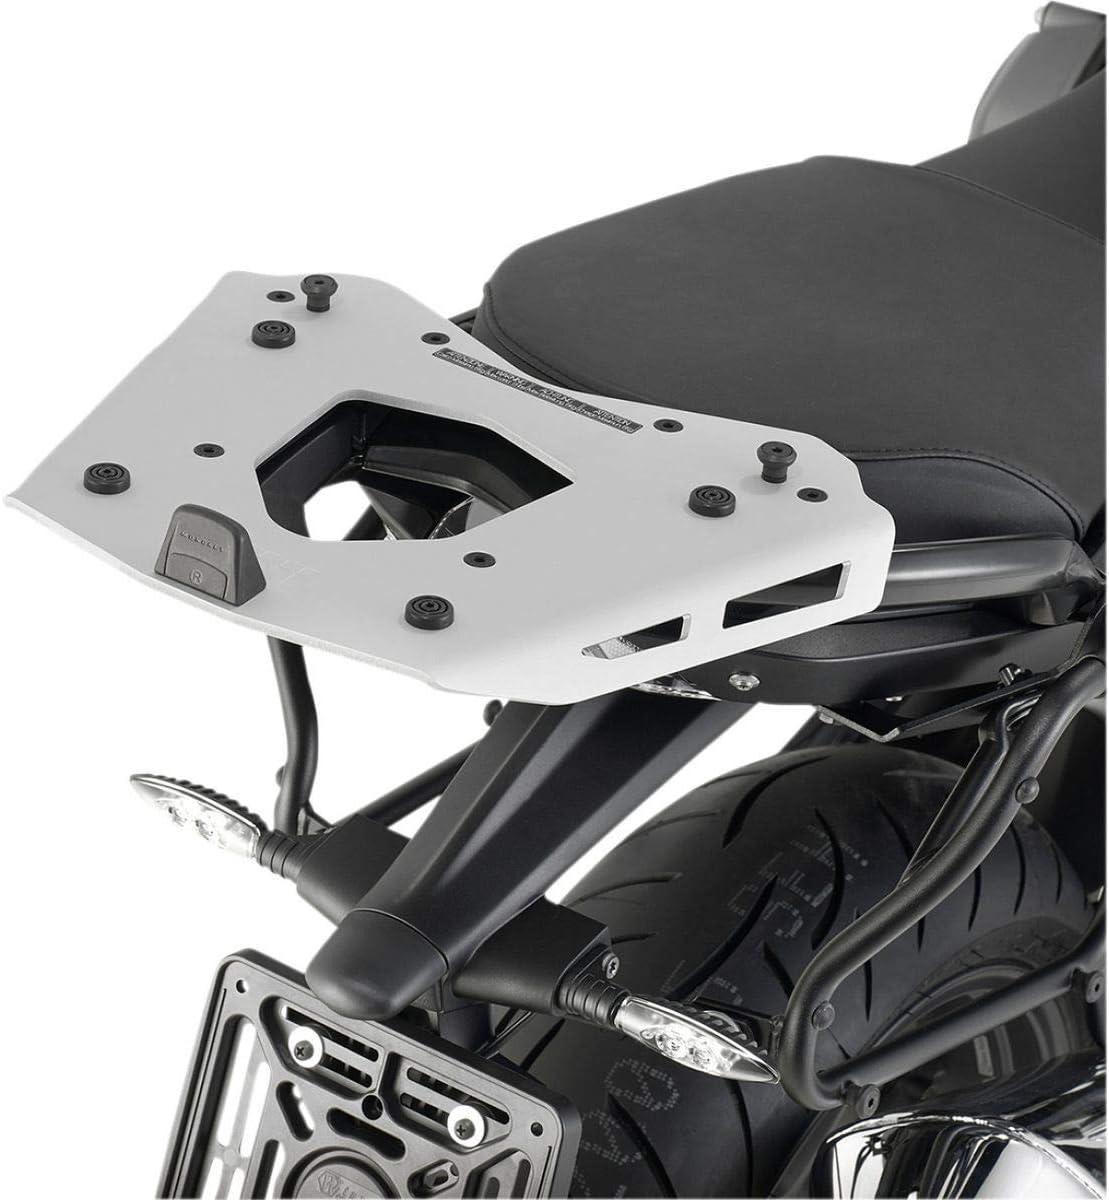 GIVI SRA5117 Monokey Topcase Mounting Adapter - BMW R1200R / R1200RS